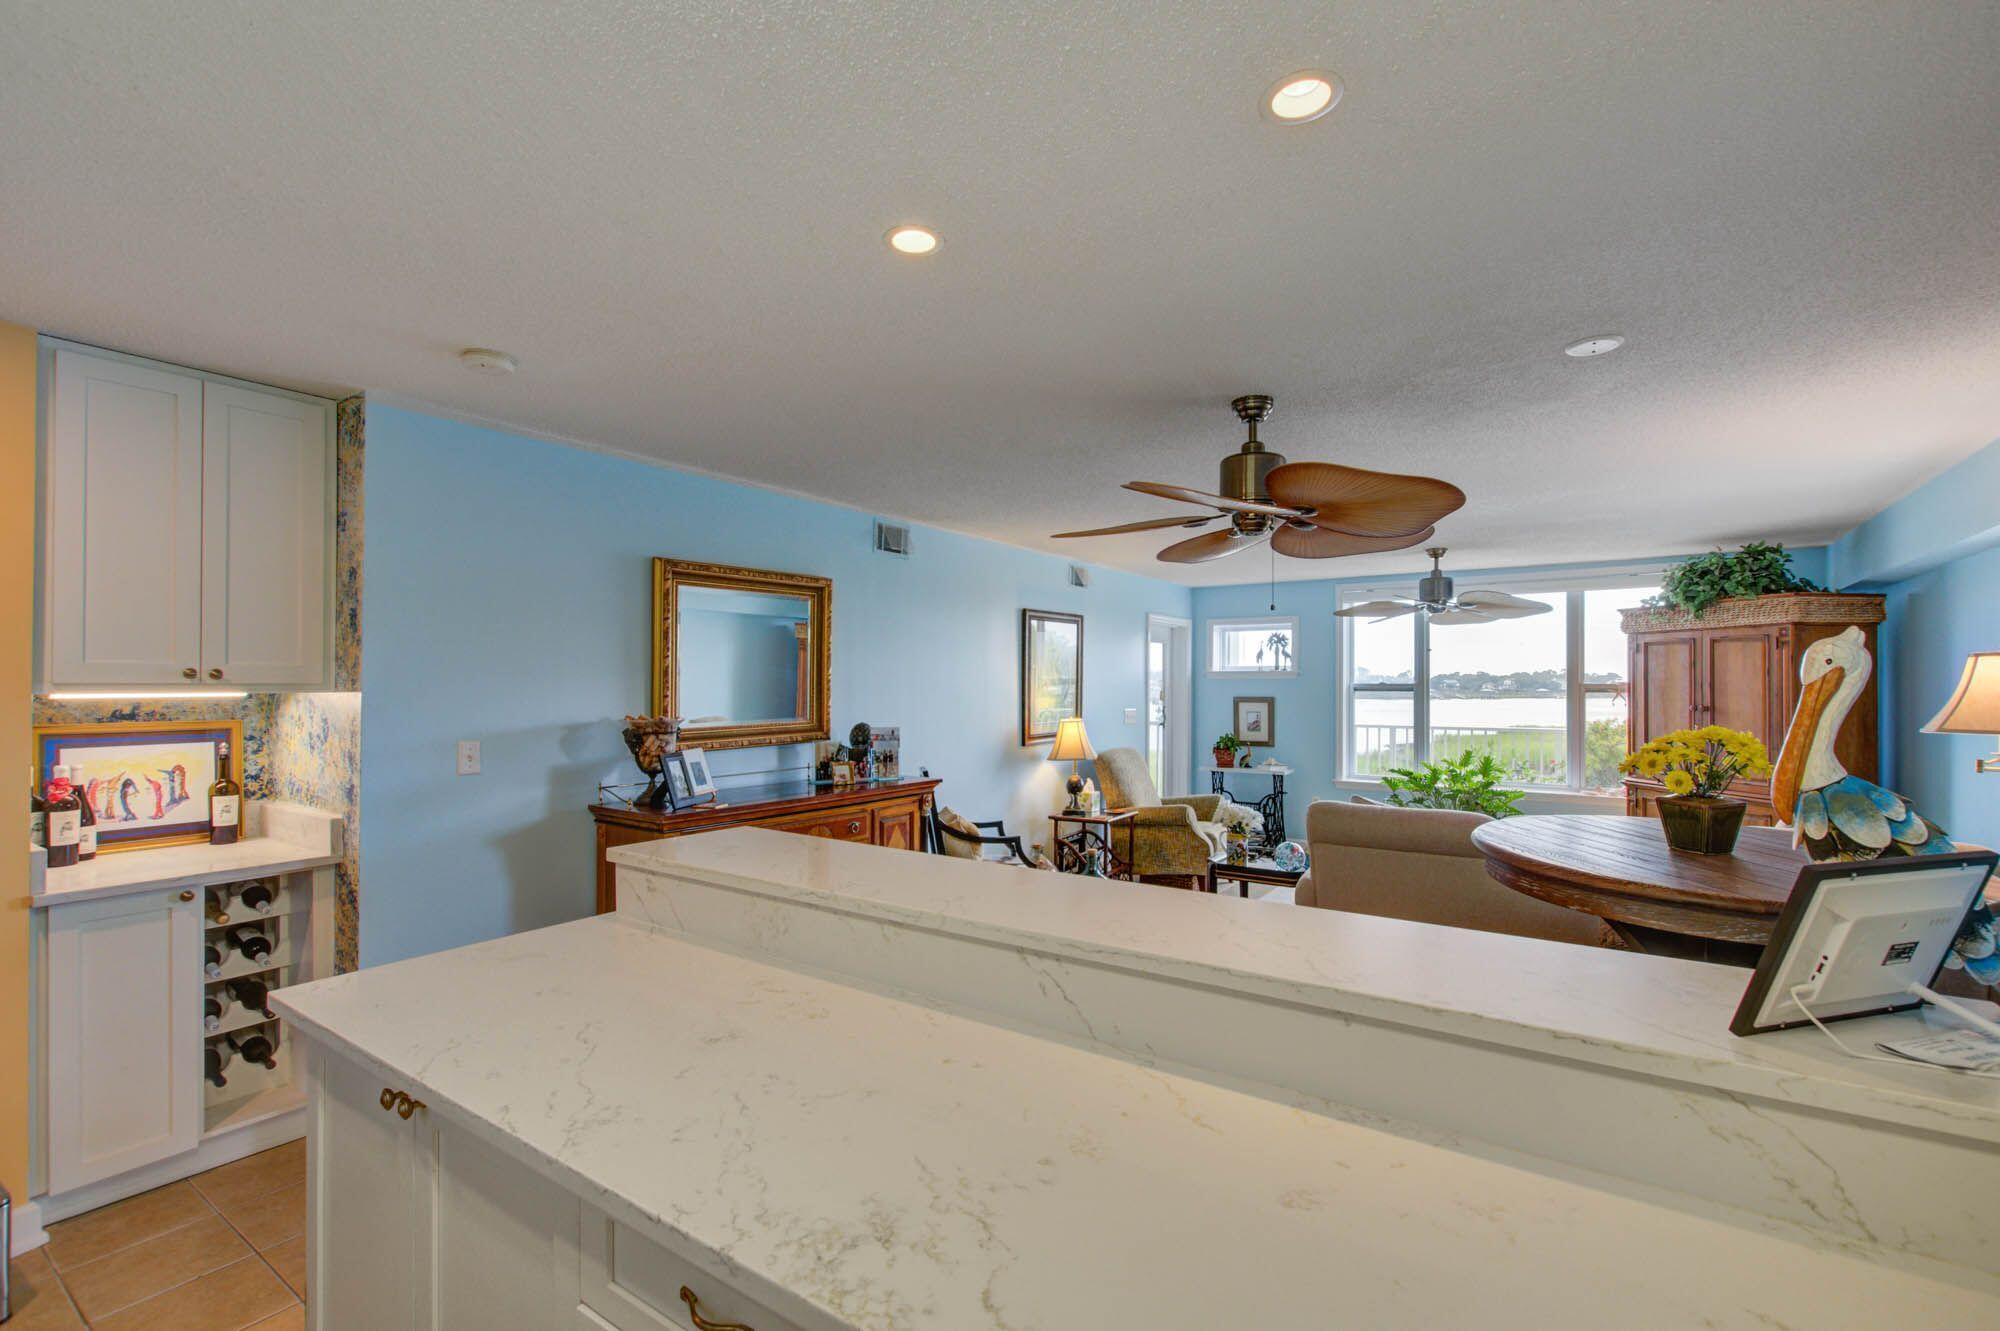 Turn of River Homes For Sale - 2395 Folly, Folly Beach, SC - 40